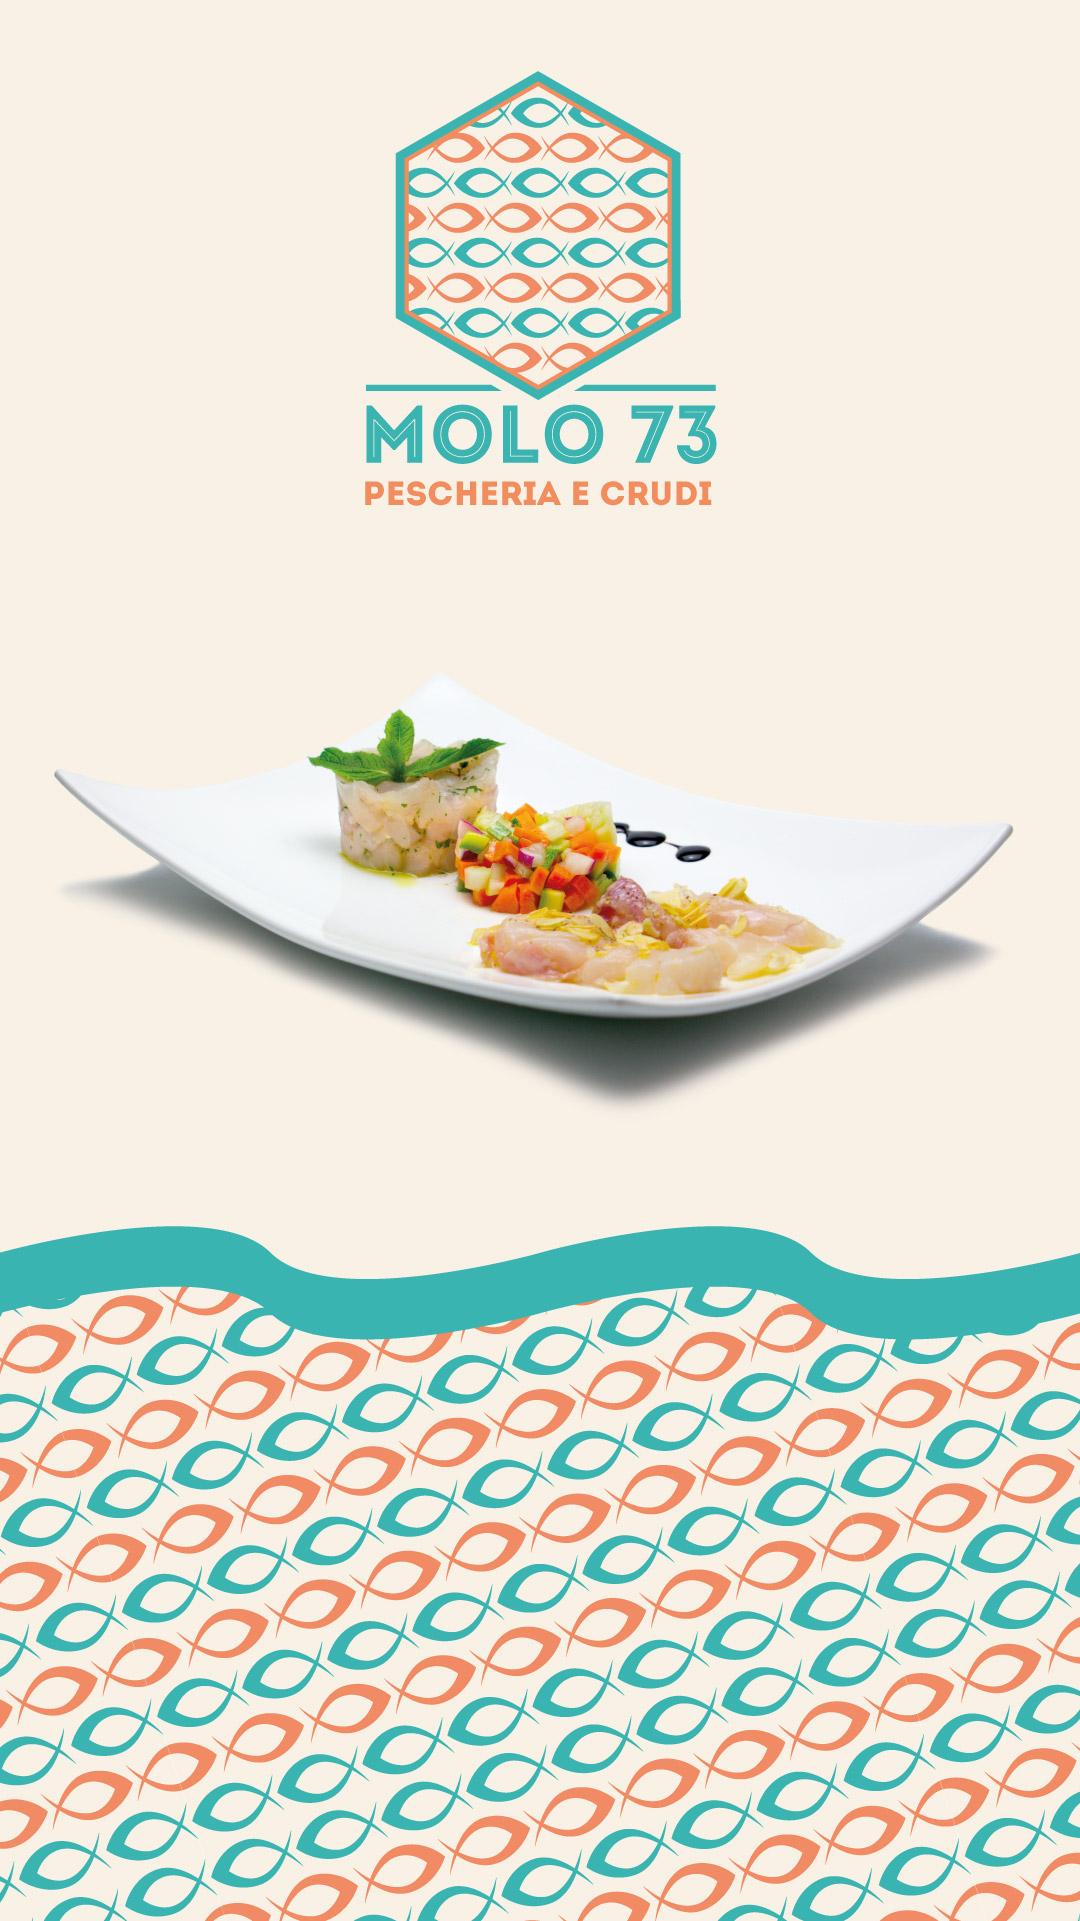 https://www.orlandinifrancesco.com/wp/wp-content/uploads/2019/01/Molo-72-Logo-5.jpg